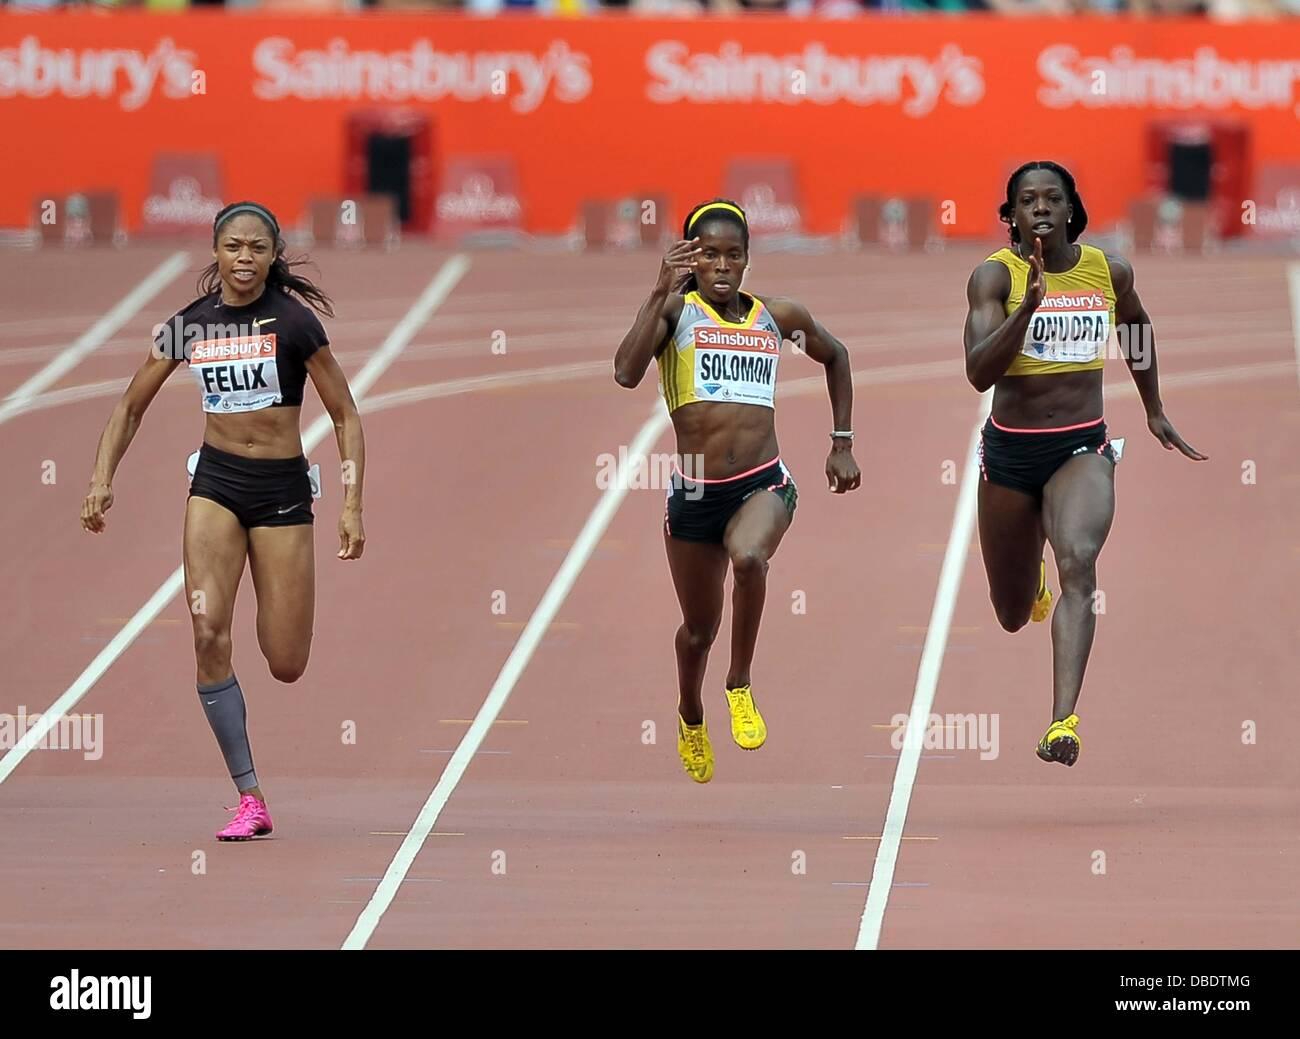 London, UK. 27th July, 2013. Allyson Felix (USA, left), Shalonda Solomon (USA) and Anyika Onuora (GBR, right). Womens - Stock Image